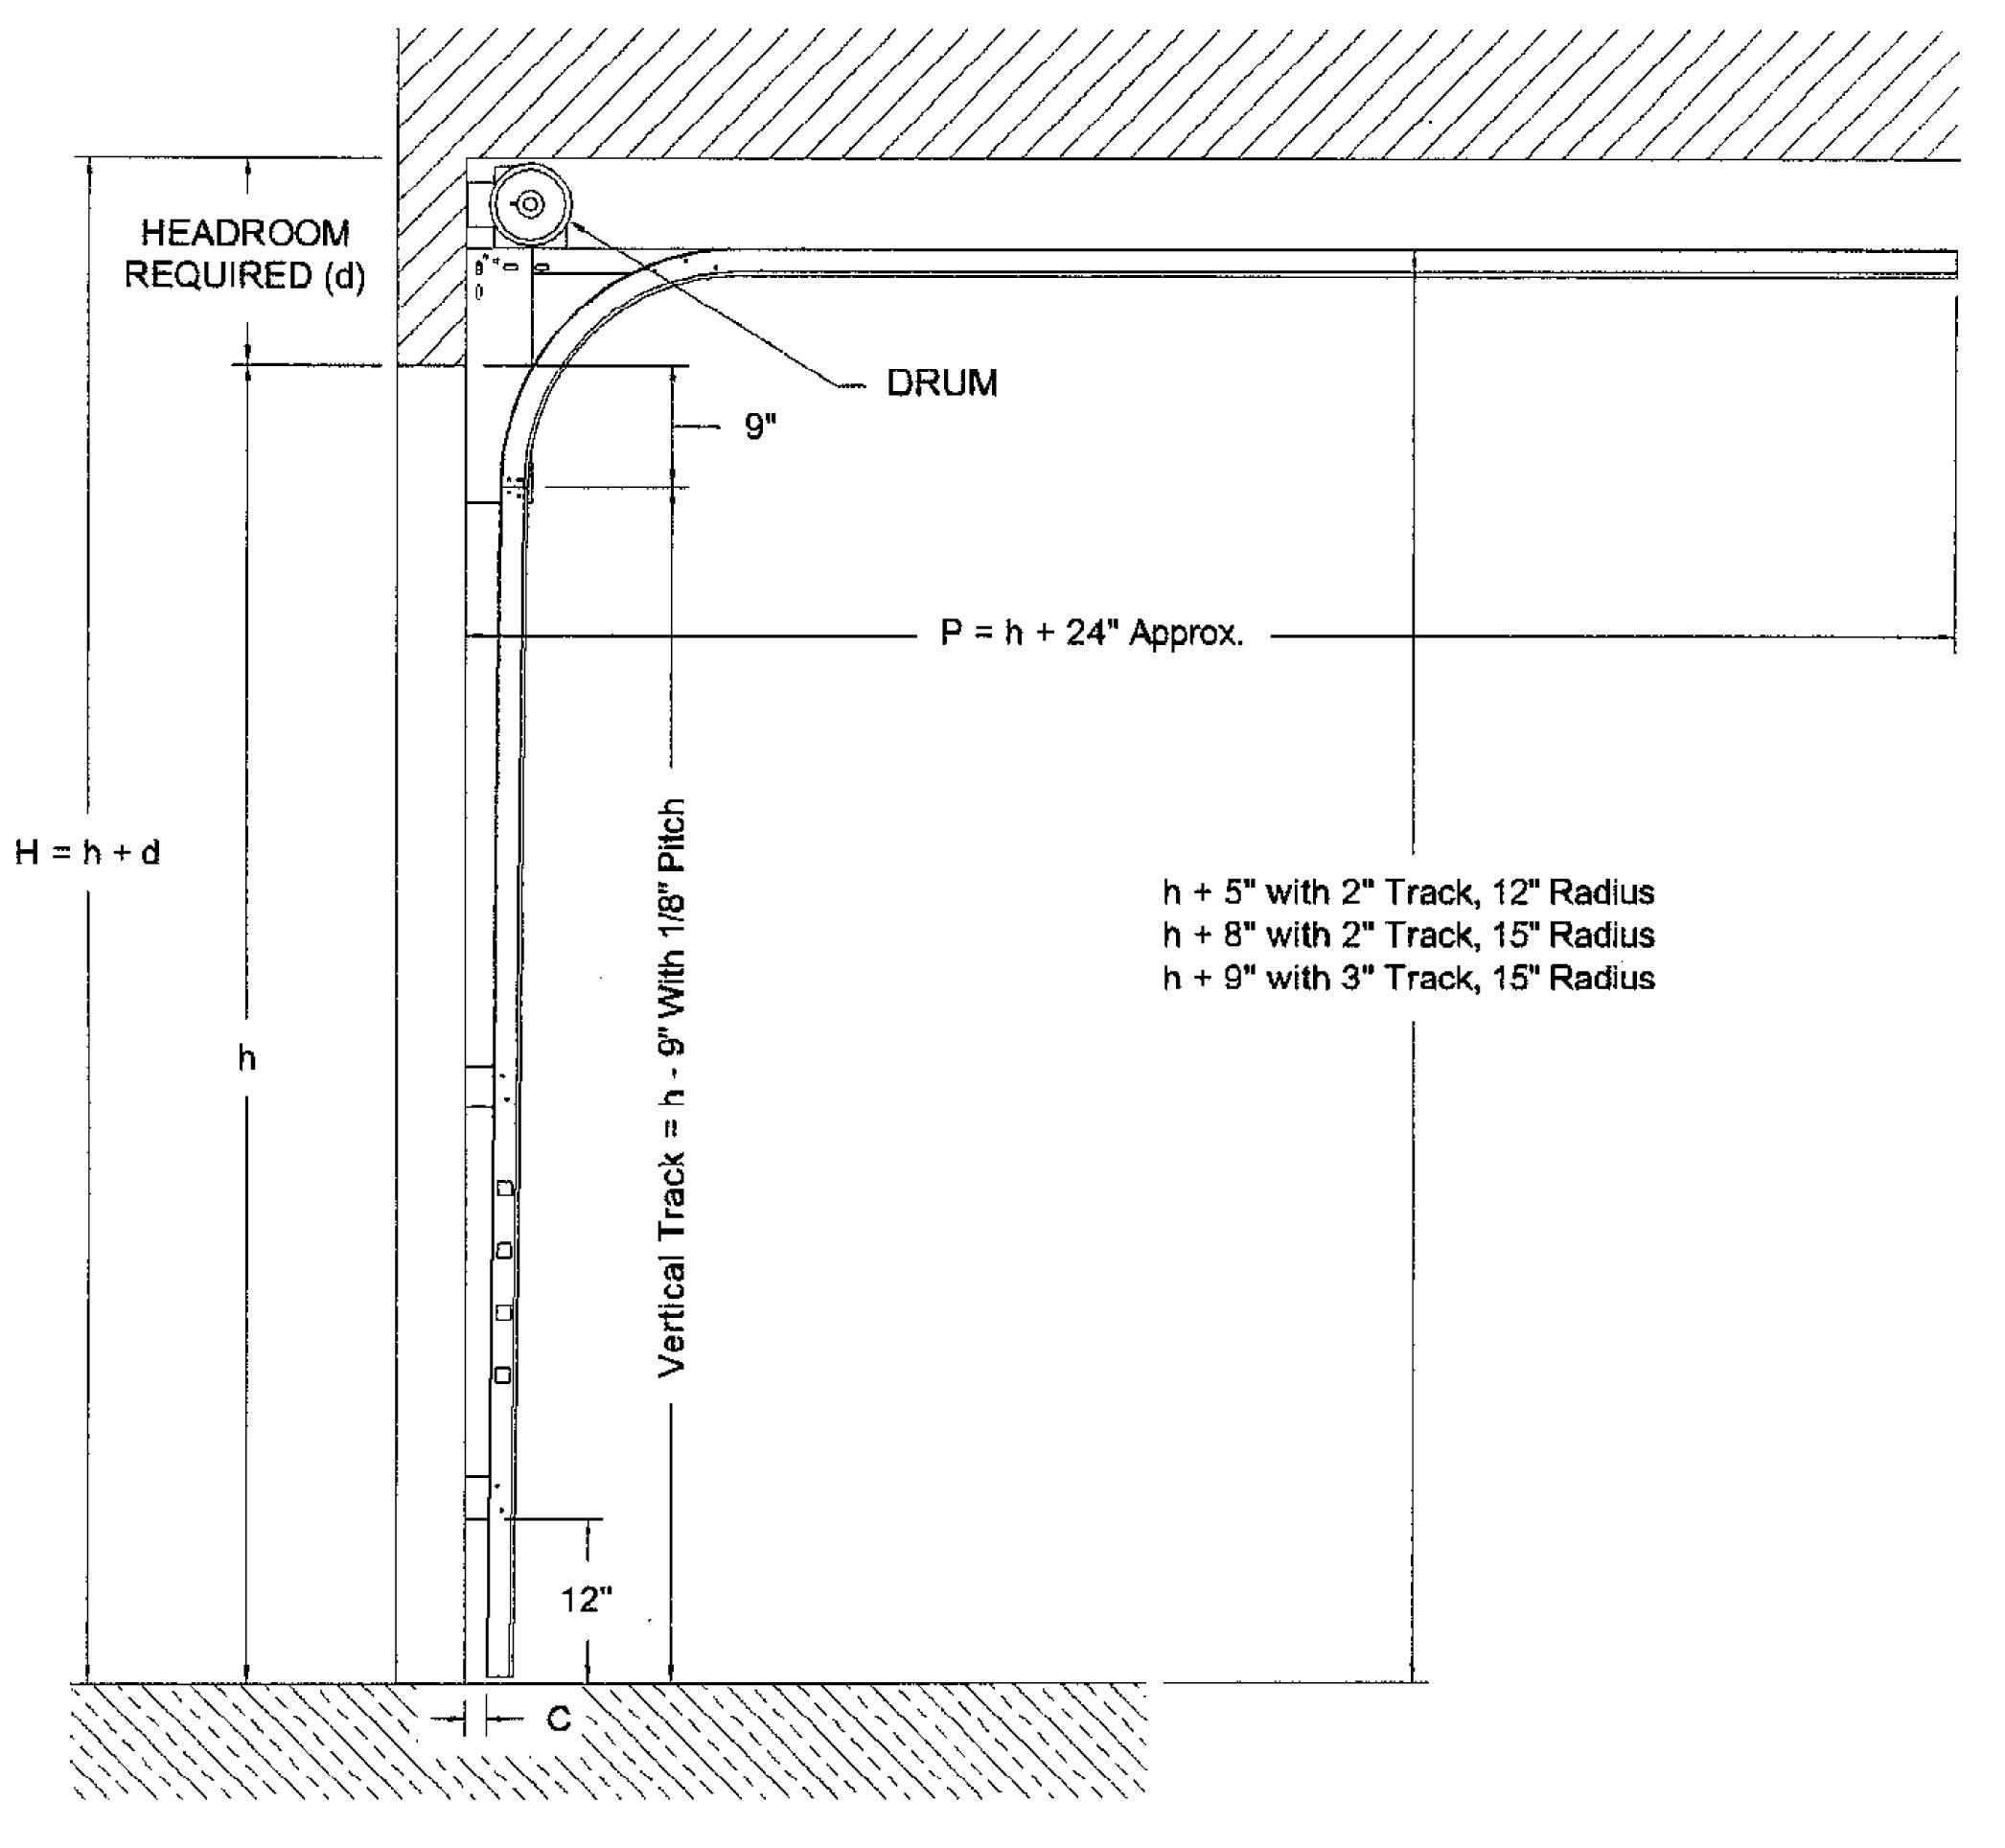 Headroom Door Frame And Calculation